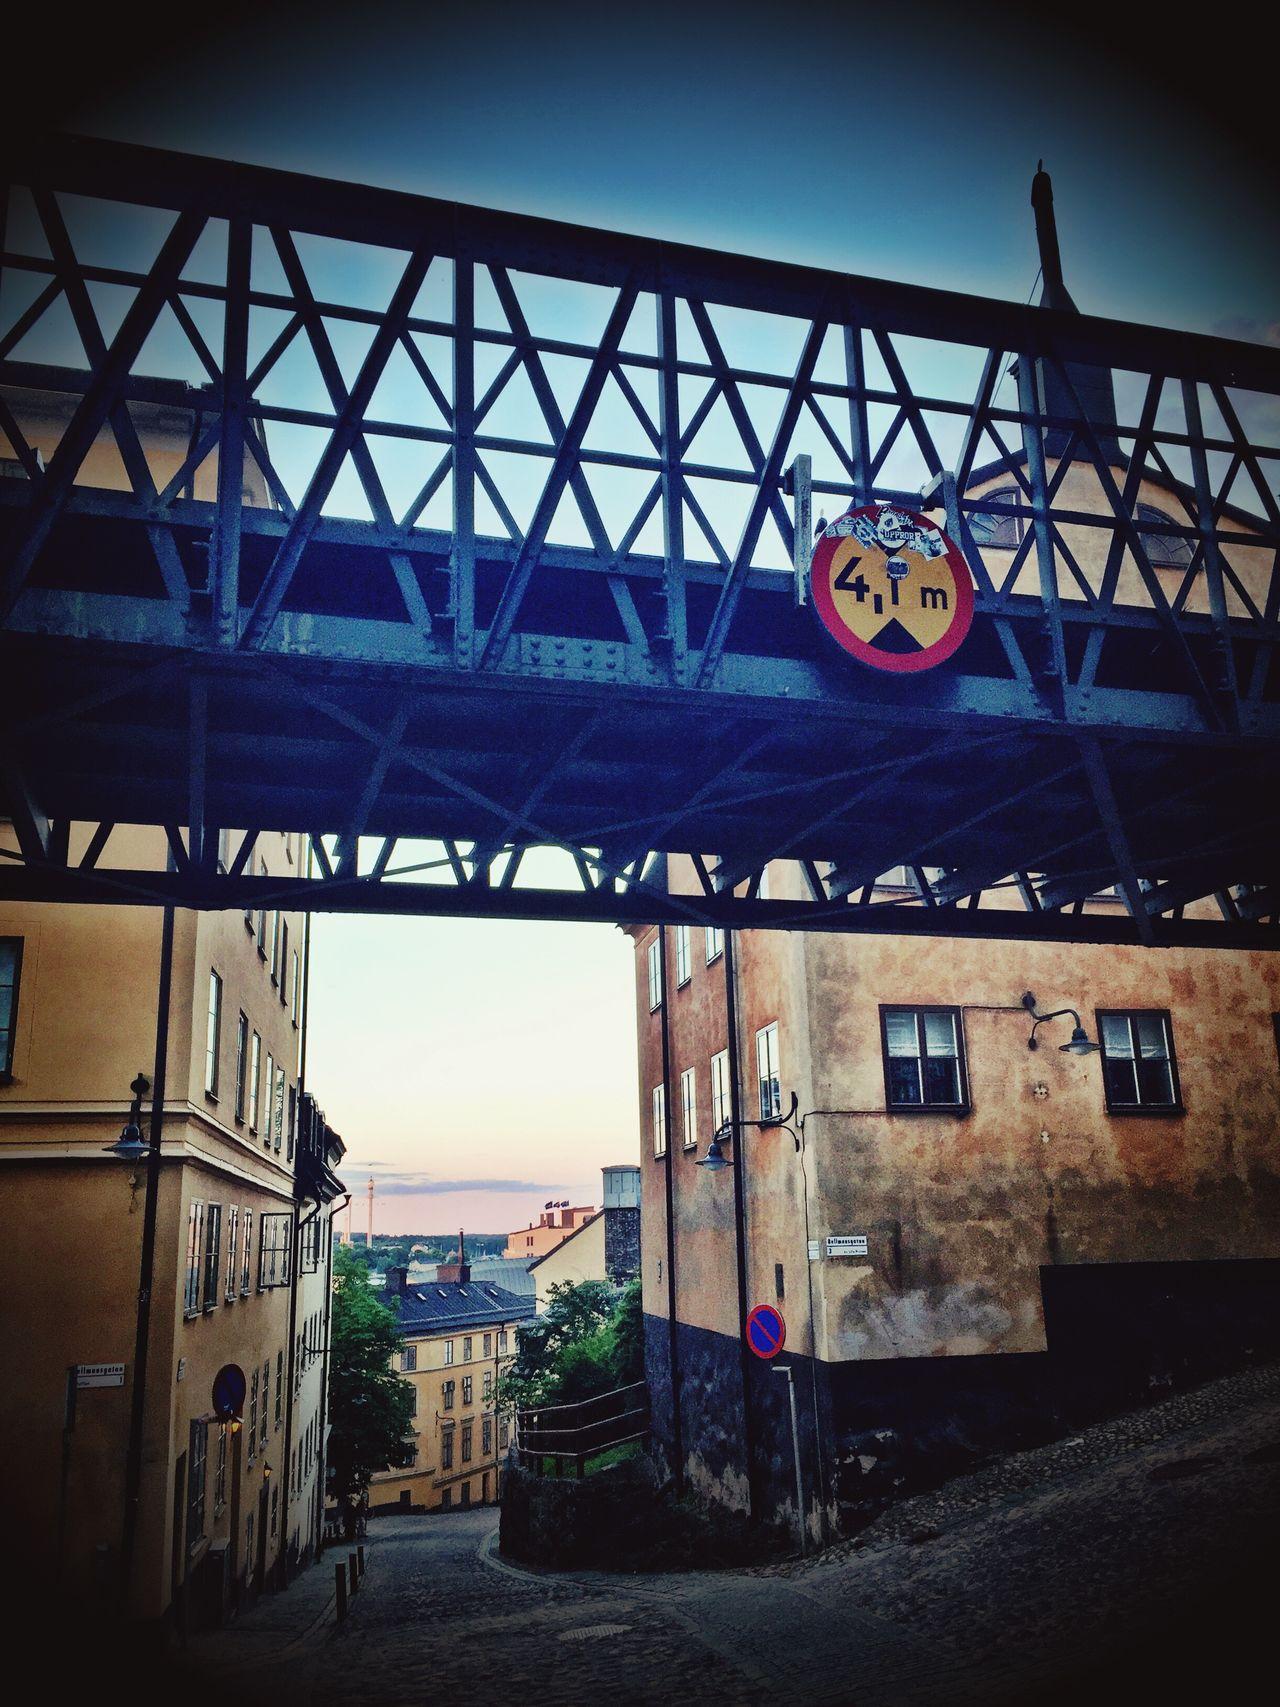 Stockholm Stockholm, Sweden Bridge IPhoneography Steep Hill Downhill